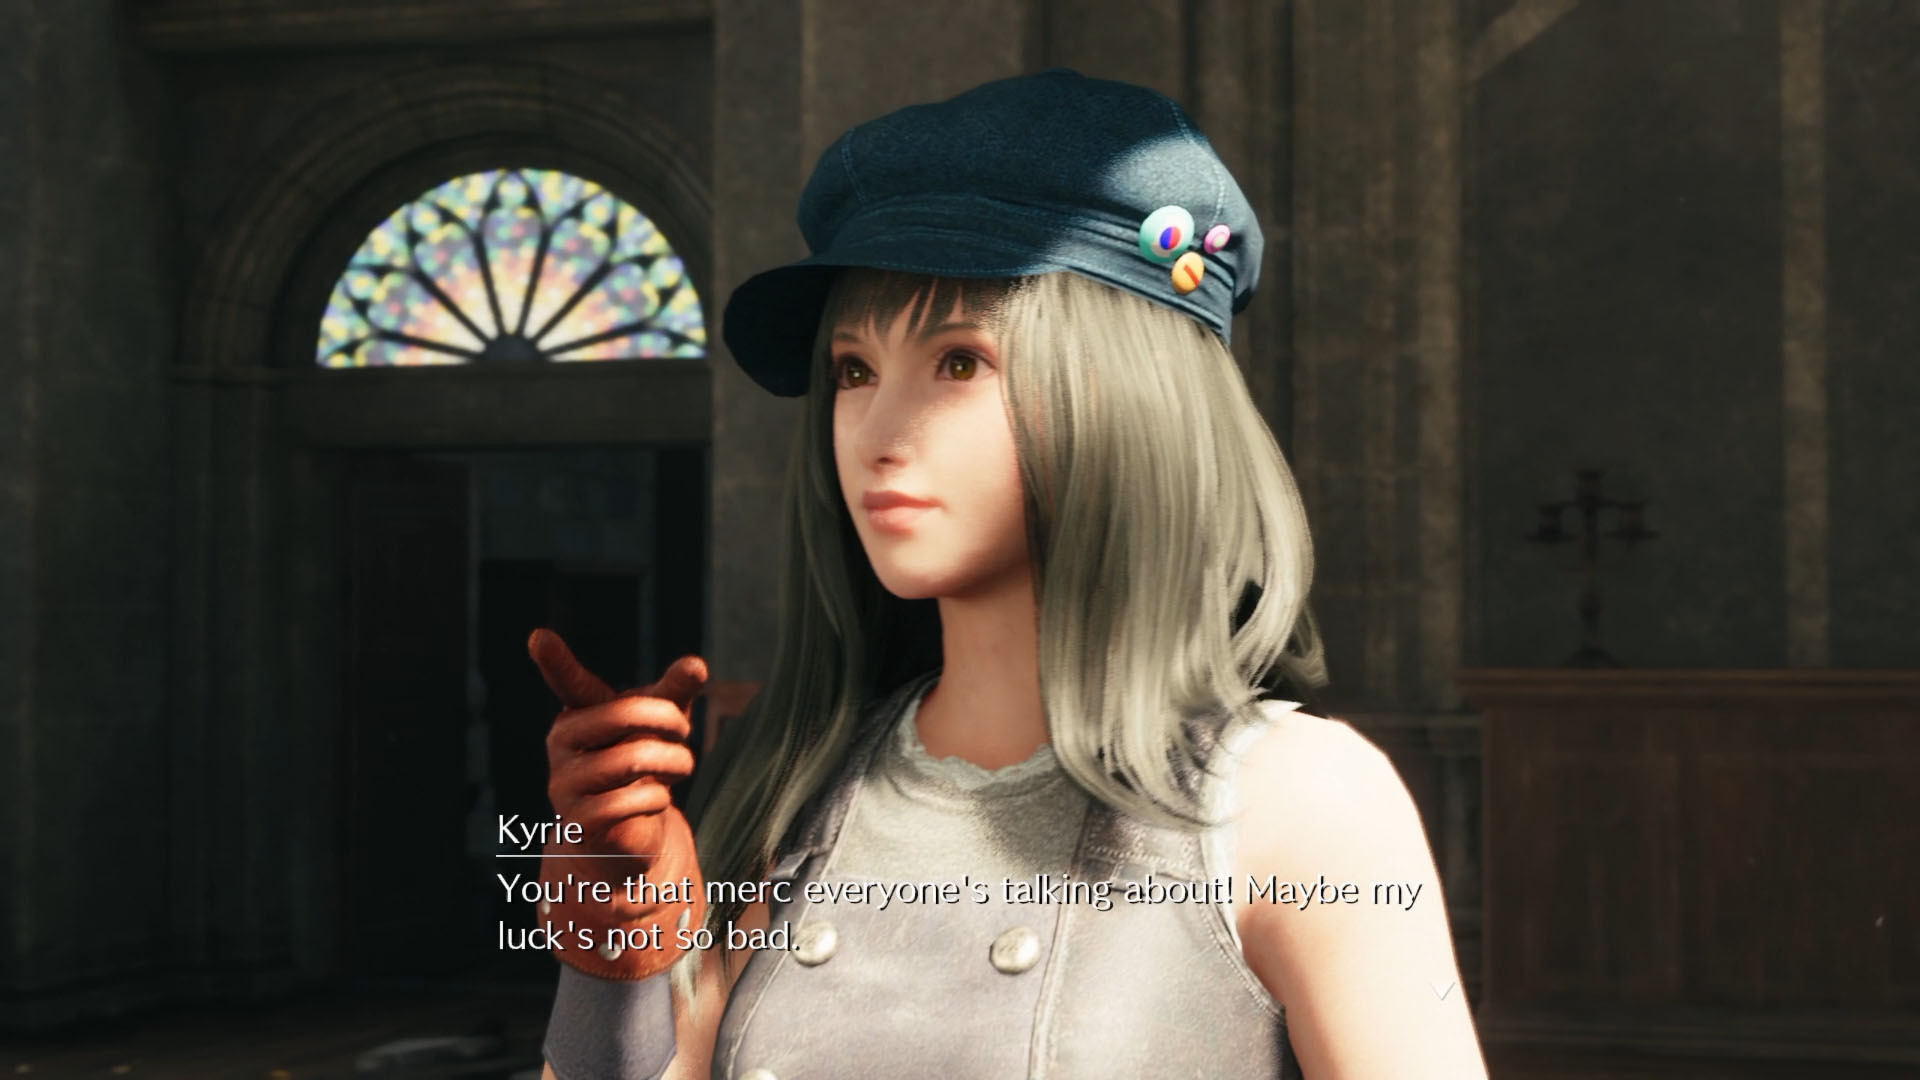 How to get the Corneo's Vault Key - Final Fantasy 7 Remake